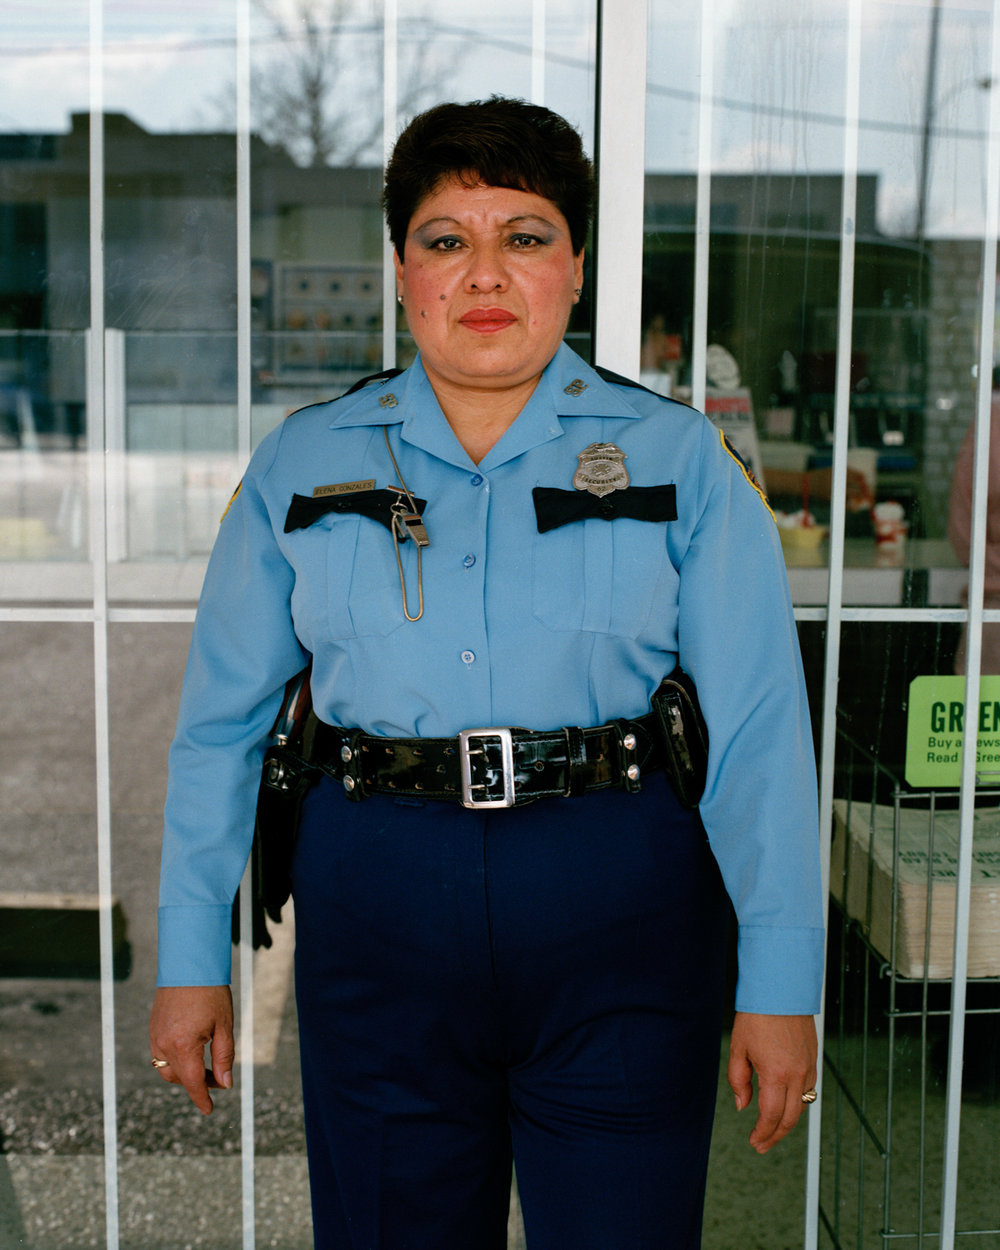 013_028_Policewoman_2 001.jpg